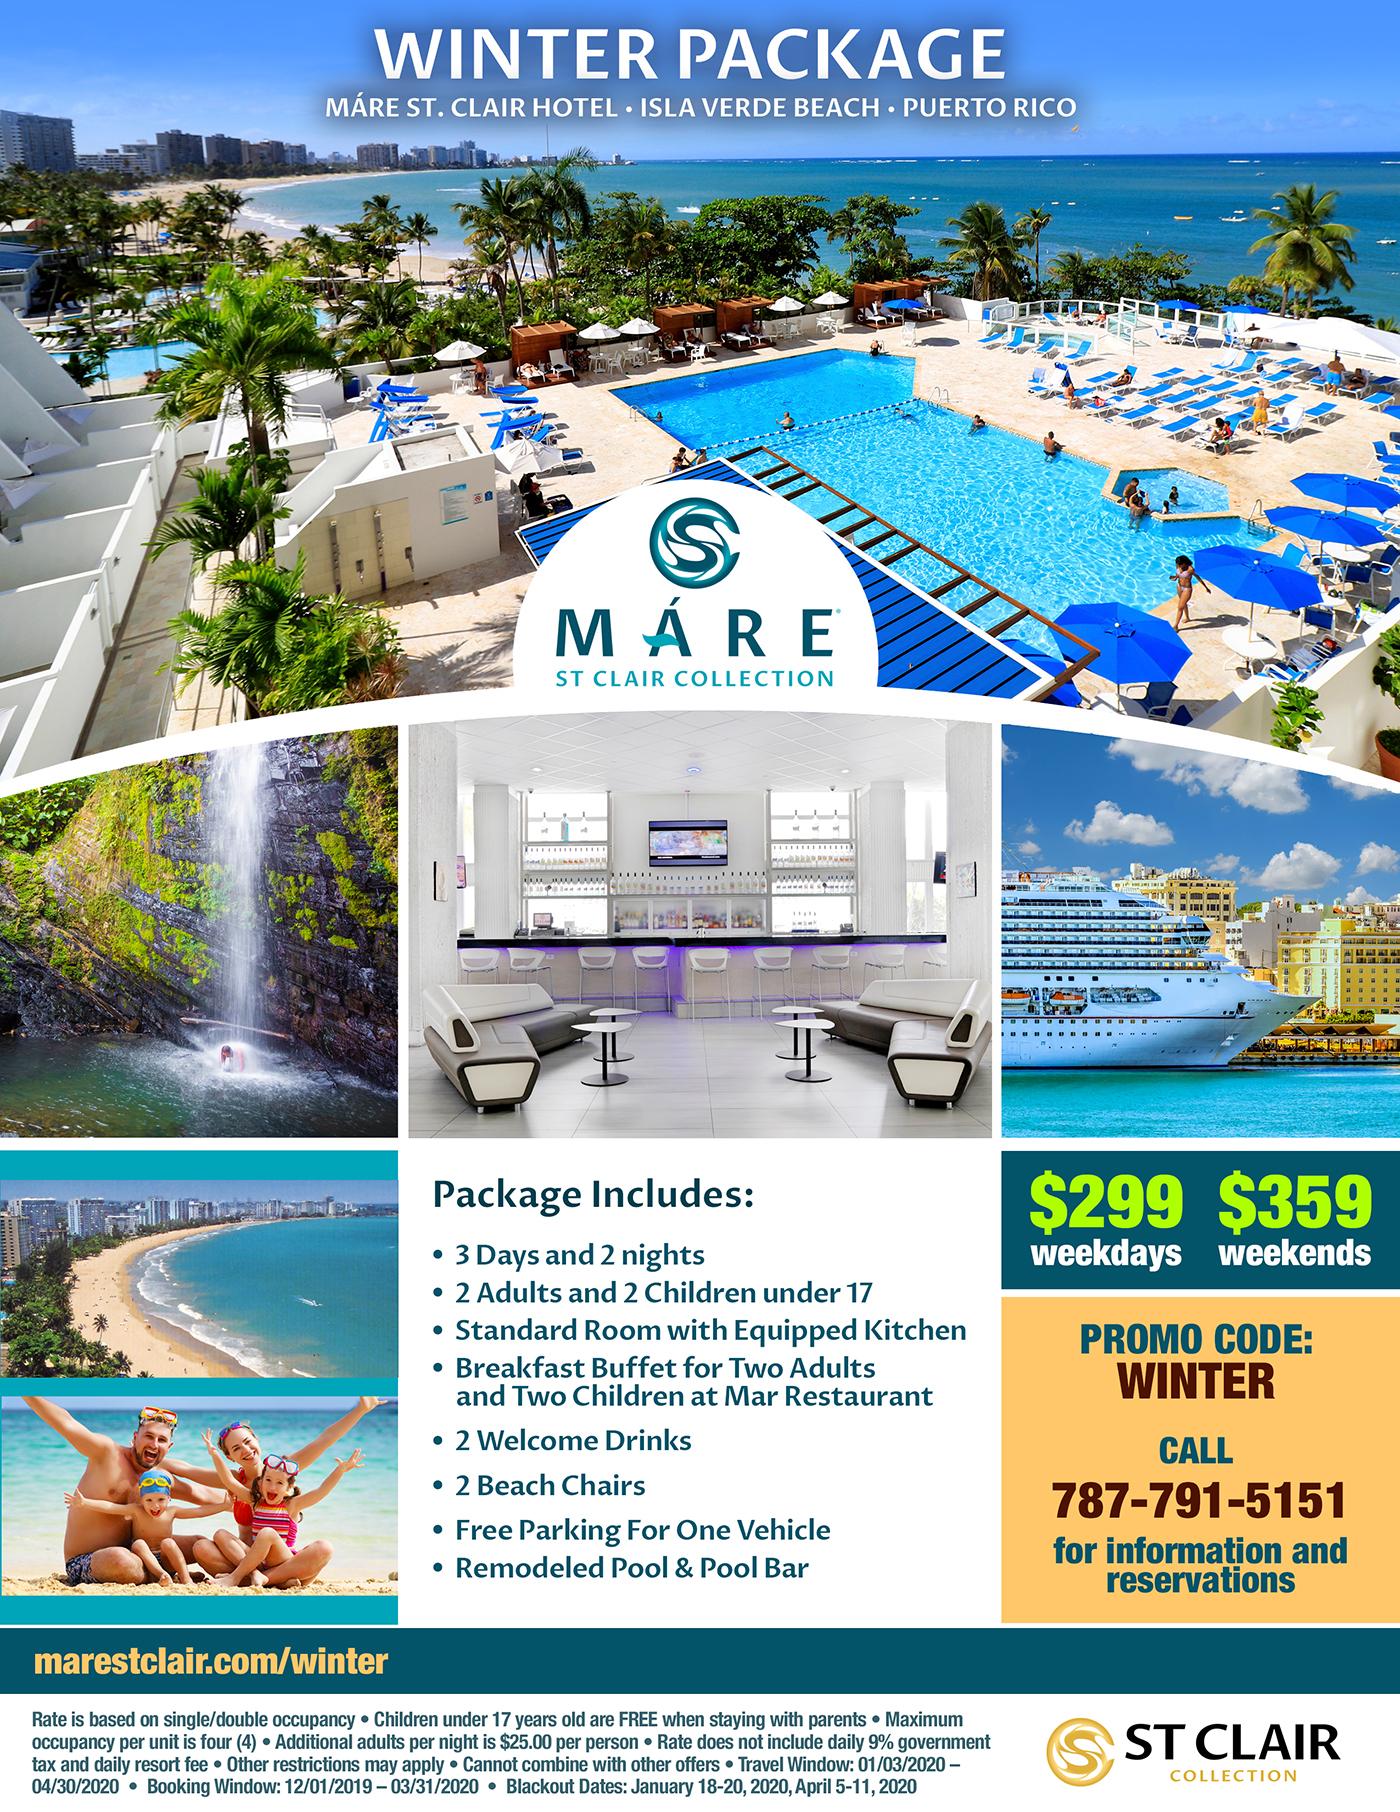 Máre St. Clair Hotel, Winter 2020 Special Offer, Puerto Rico, Isla Verde Beach